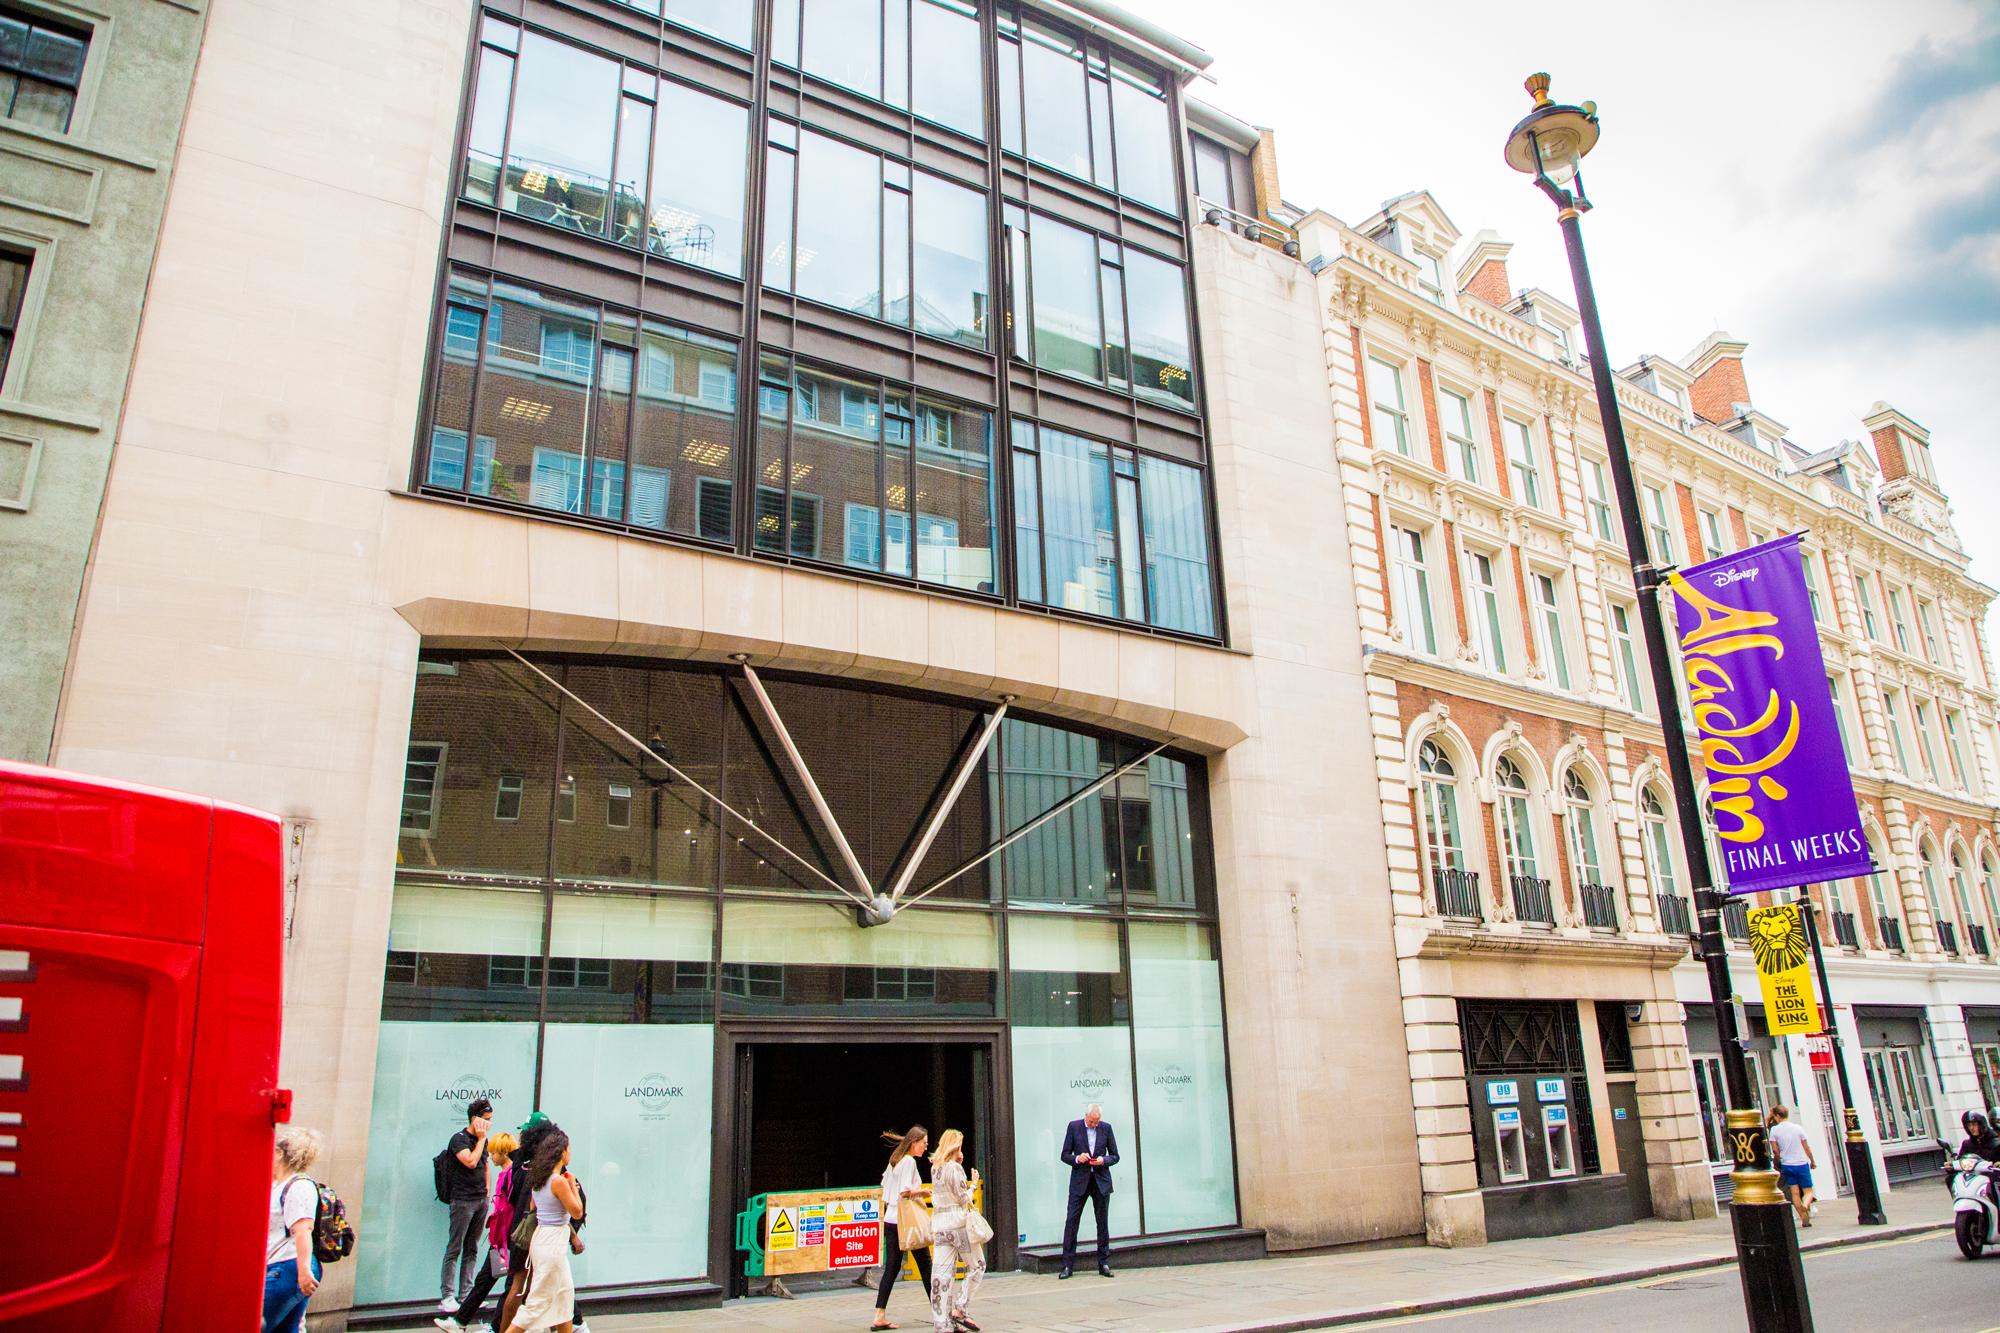 Fujifilm announces new London photography centre | Digital Camera World